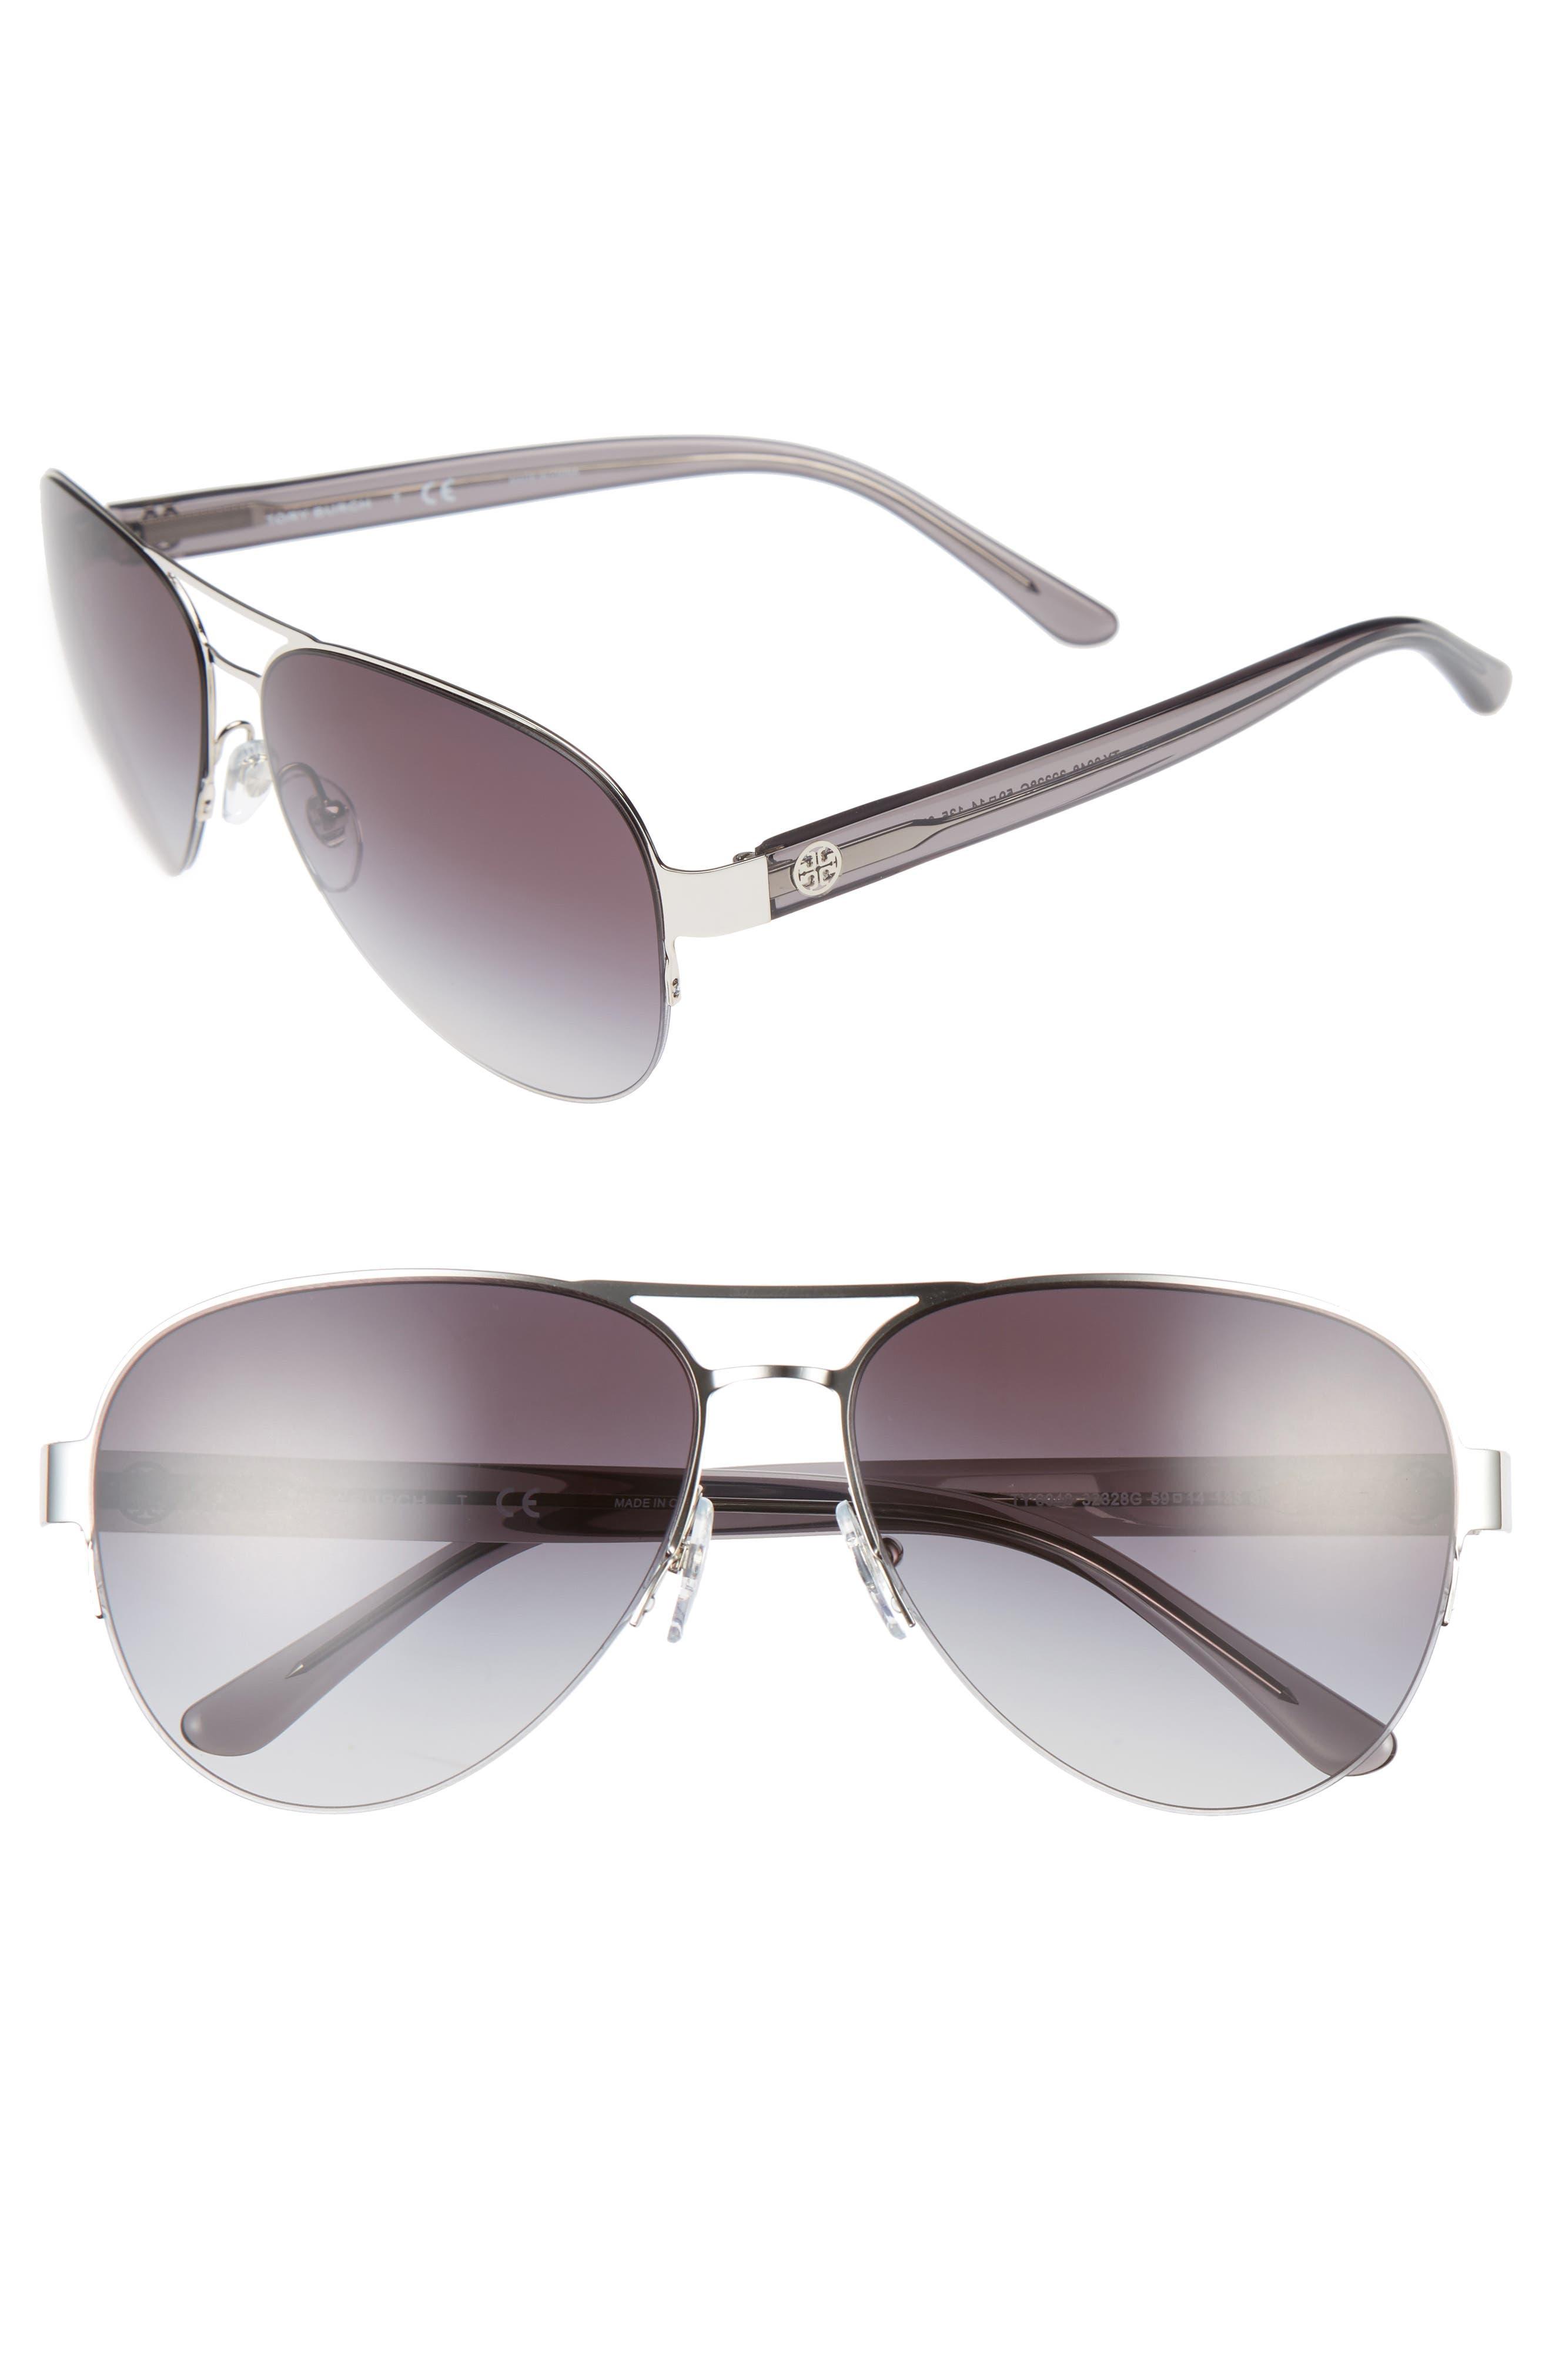 59mm Aviator Sunglasses,                         Main,                         color, Silver